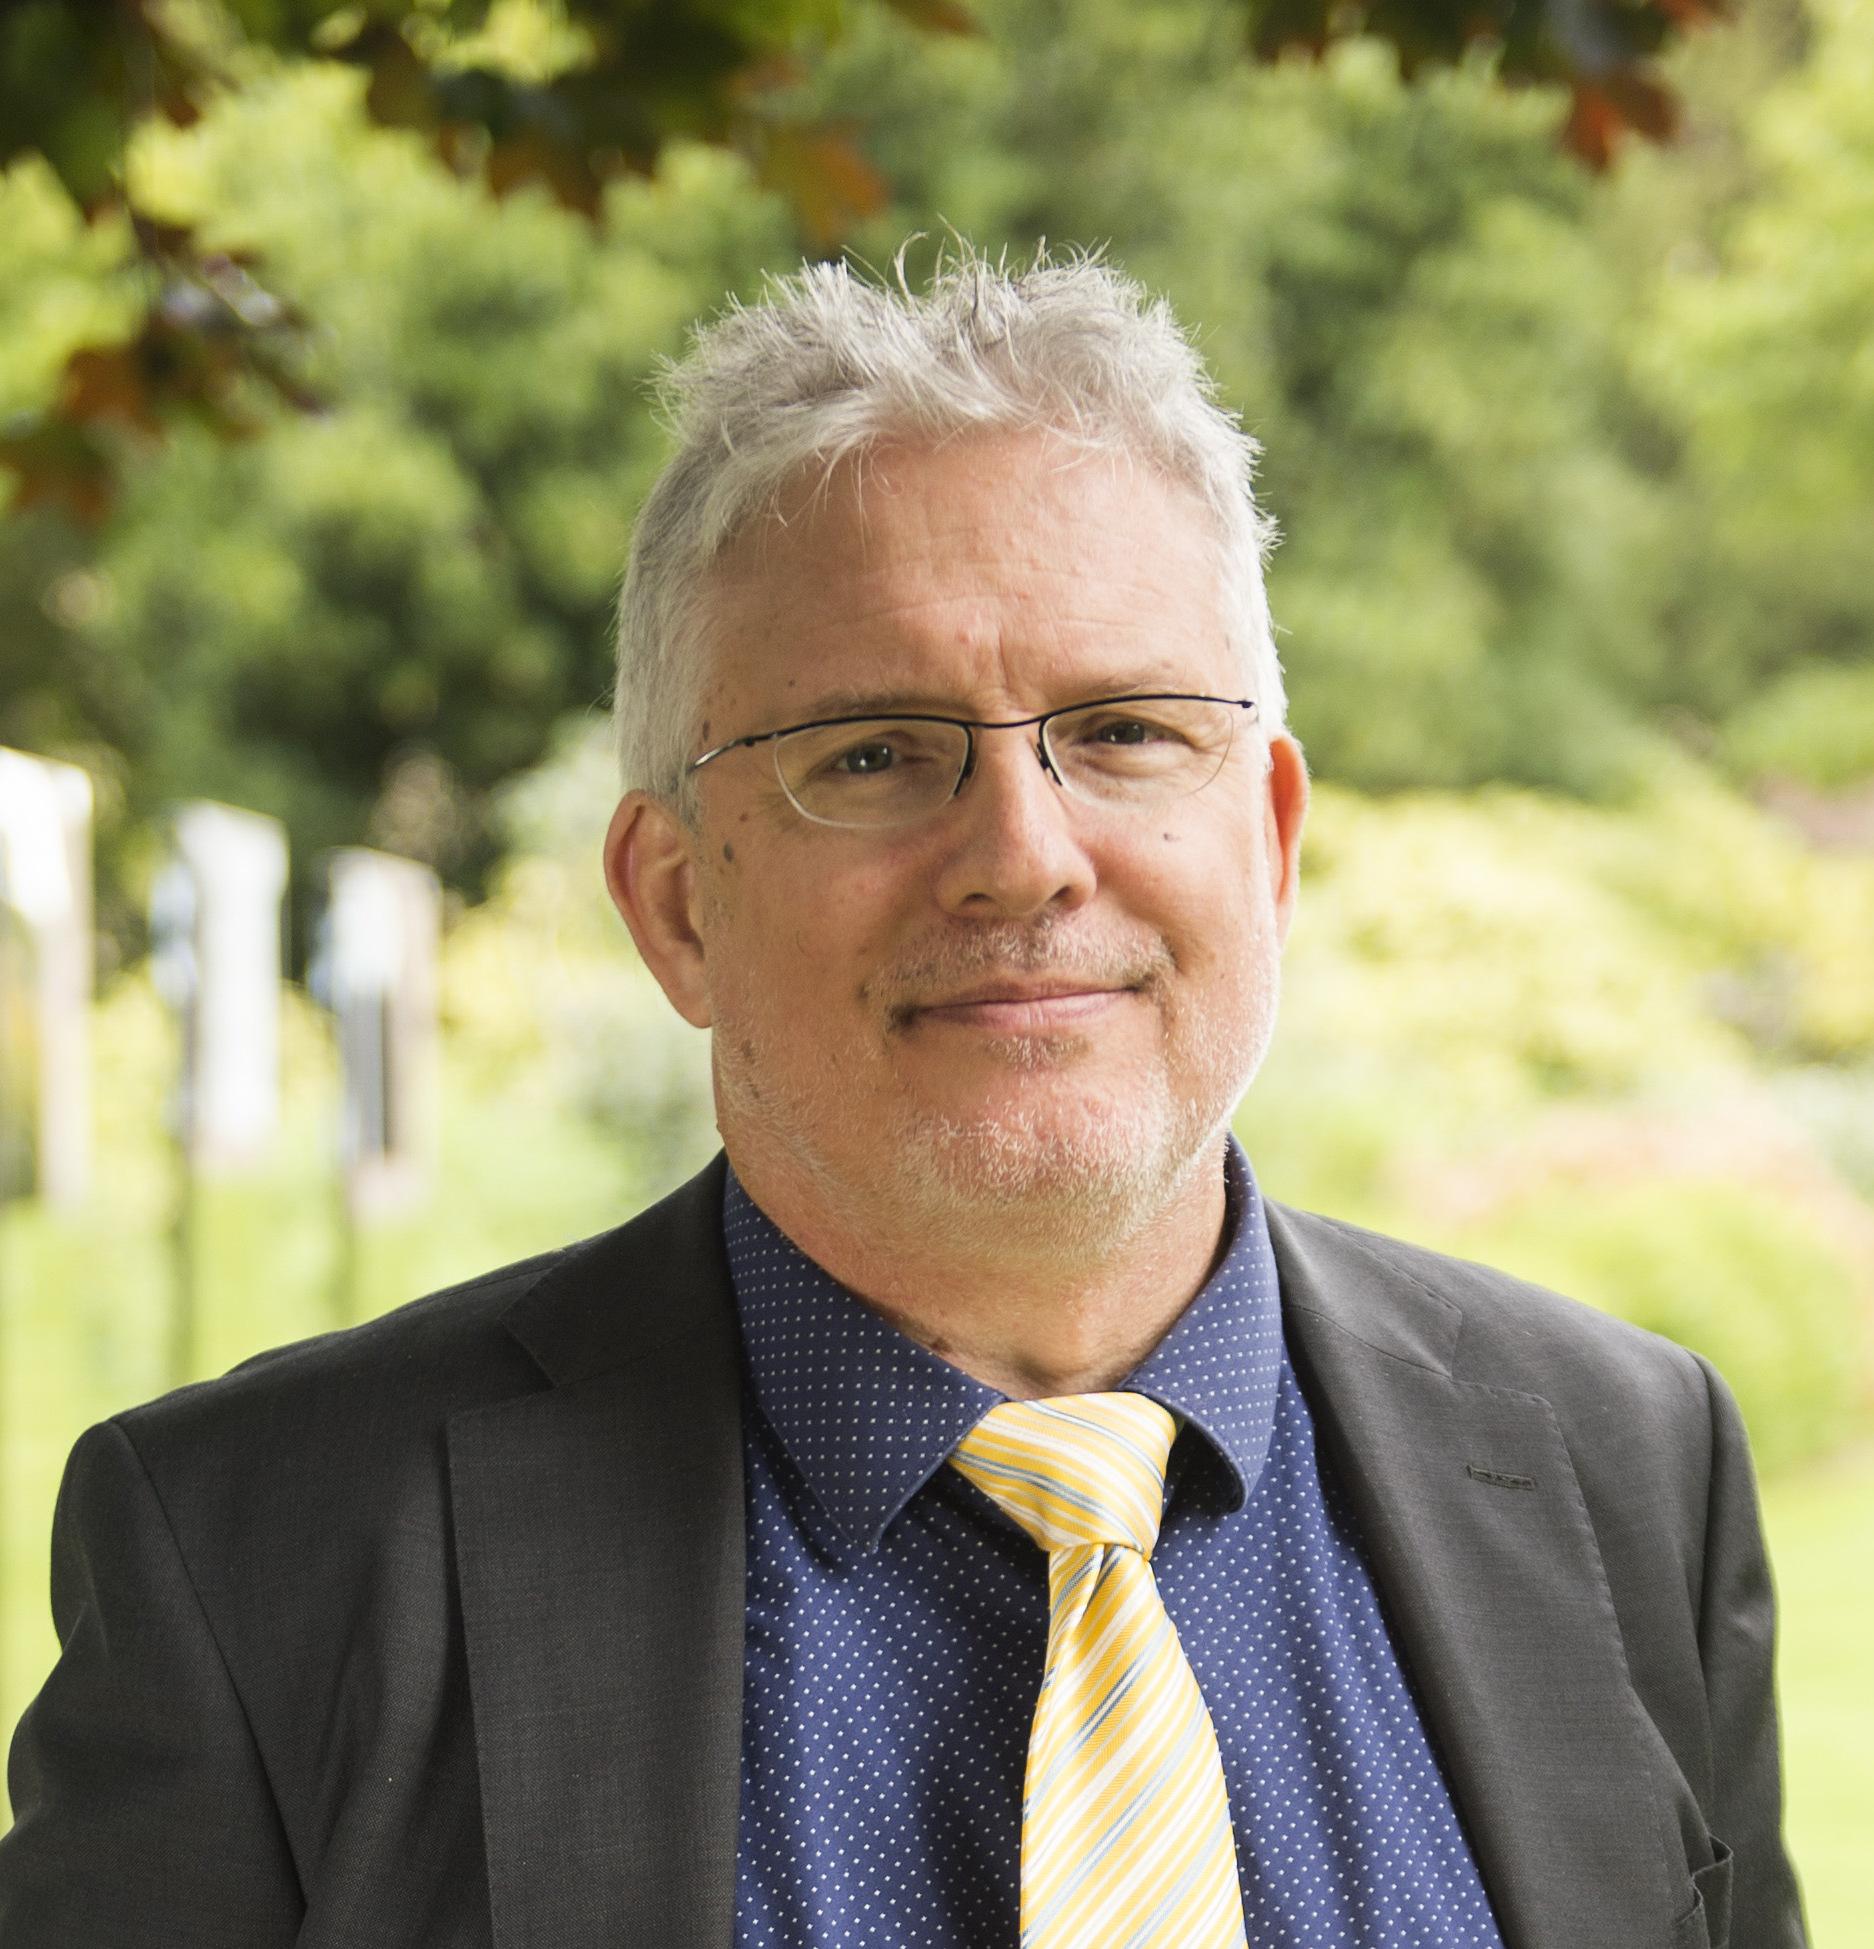 Professor Stephan Lewandowsky